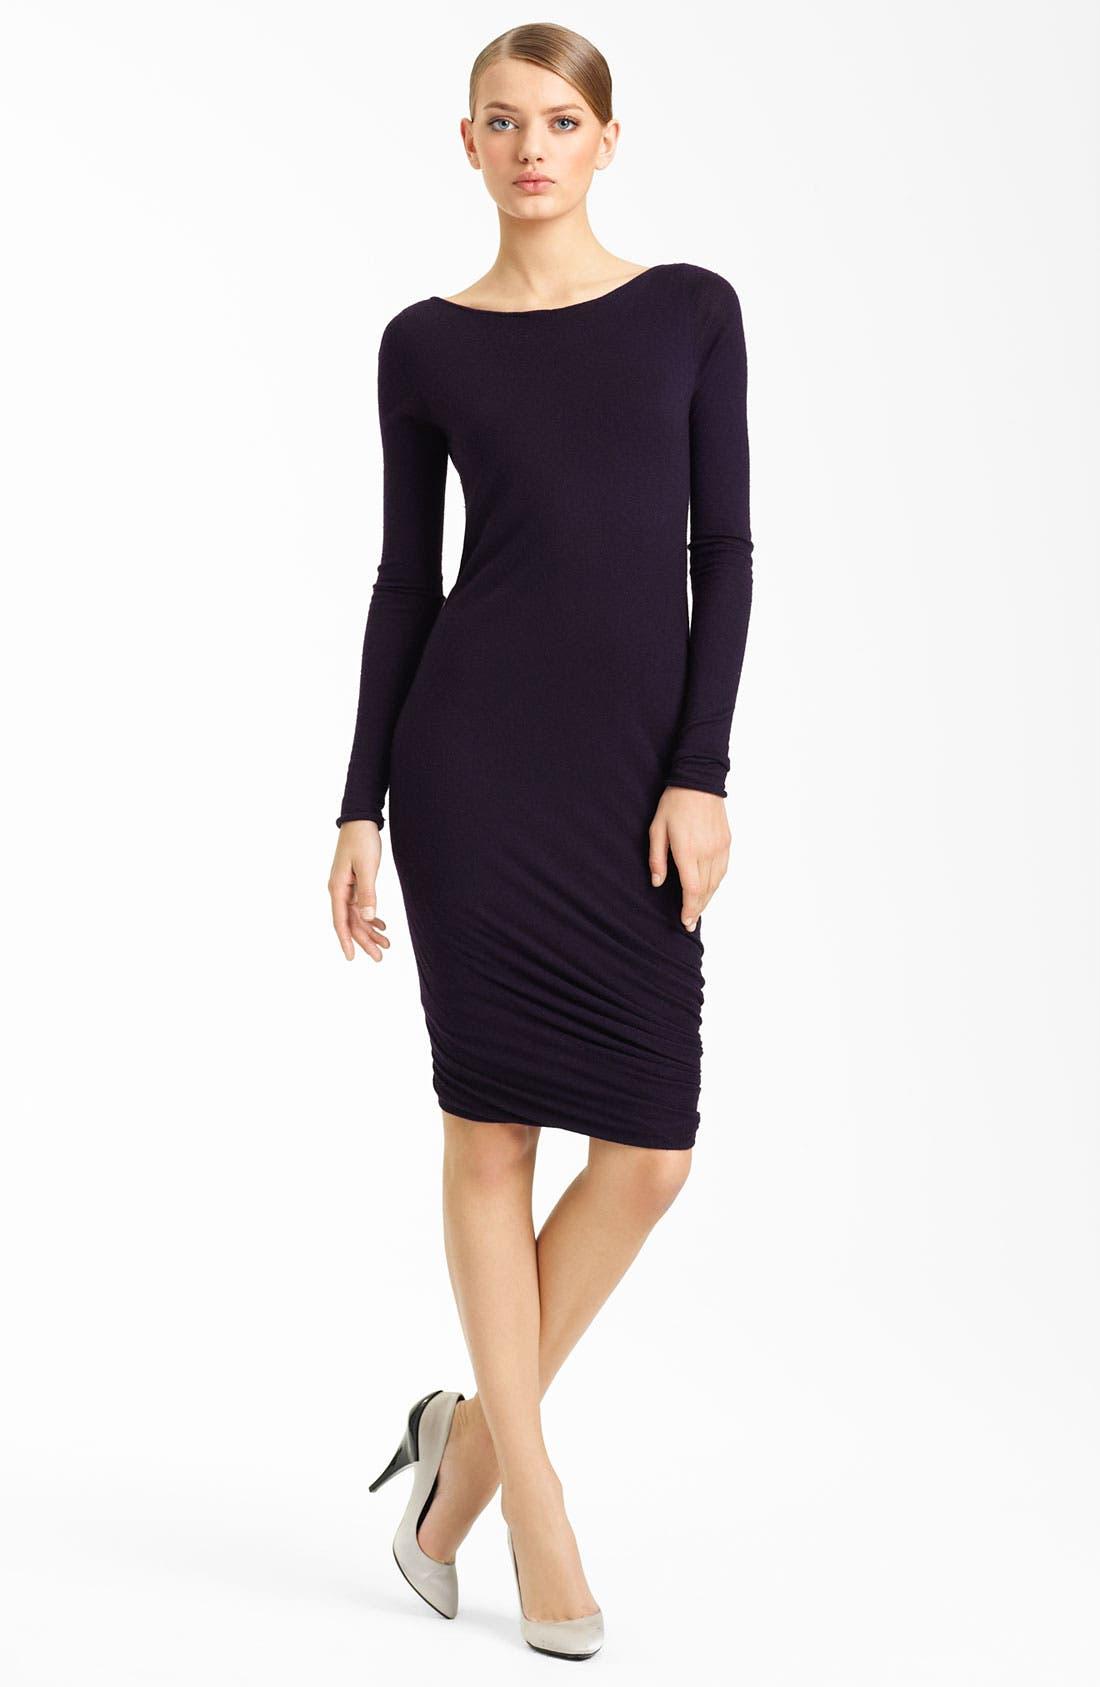 Main Image - Donna Karan Collection Twisted Hem Cashmere Dress